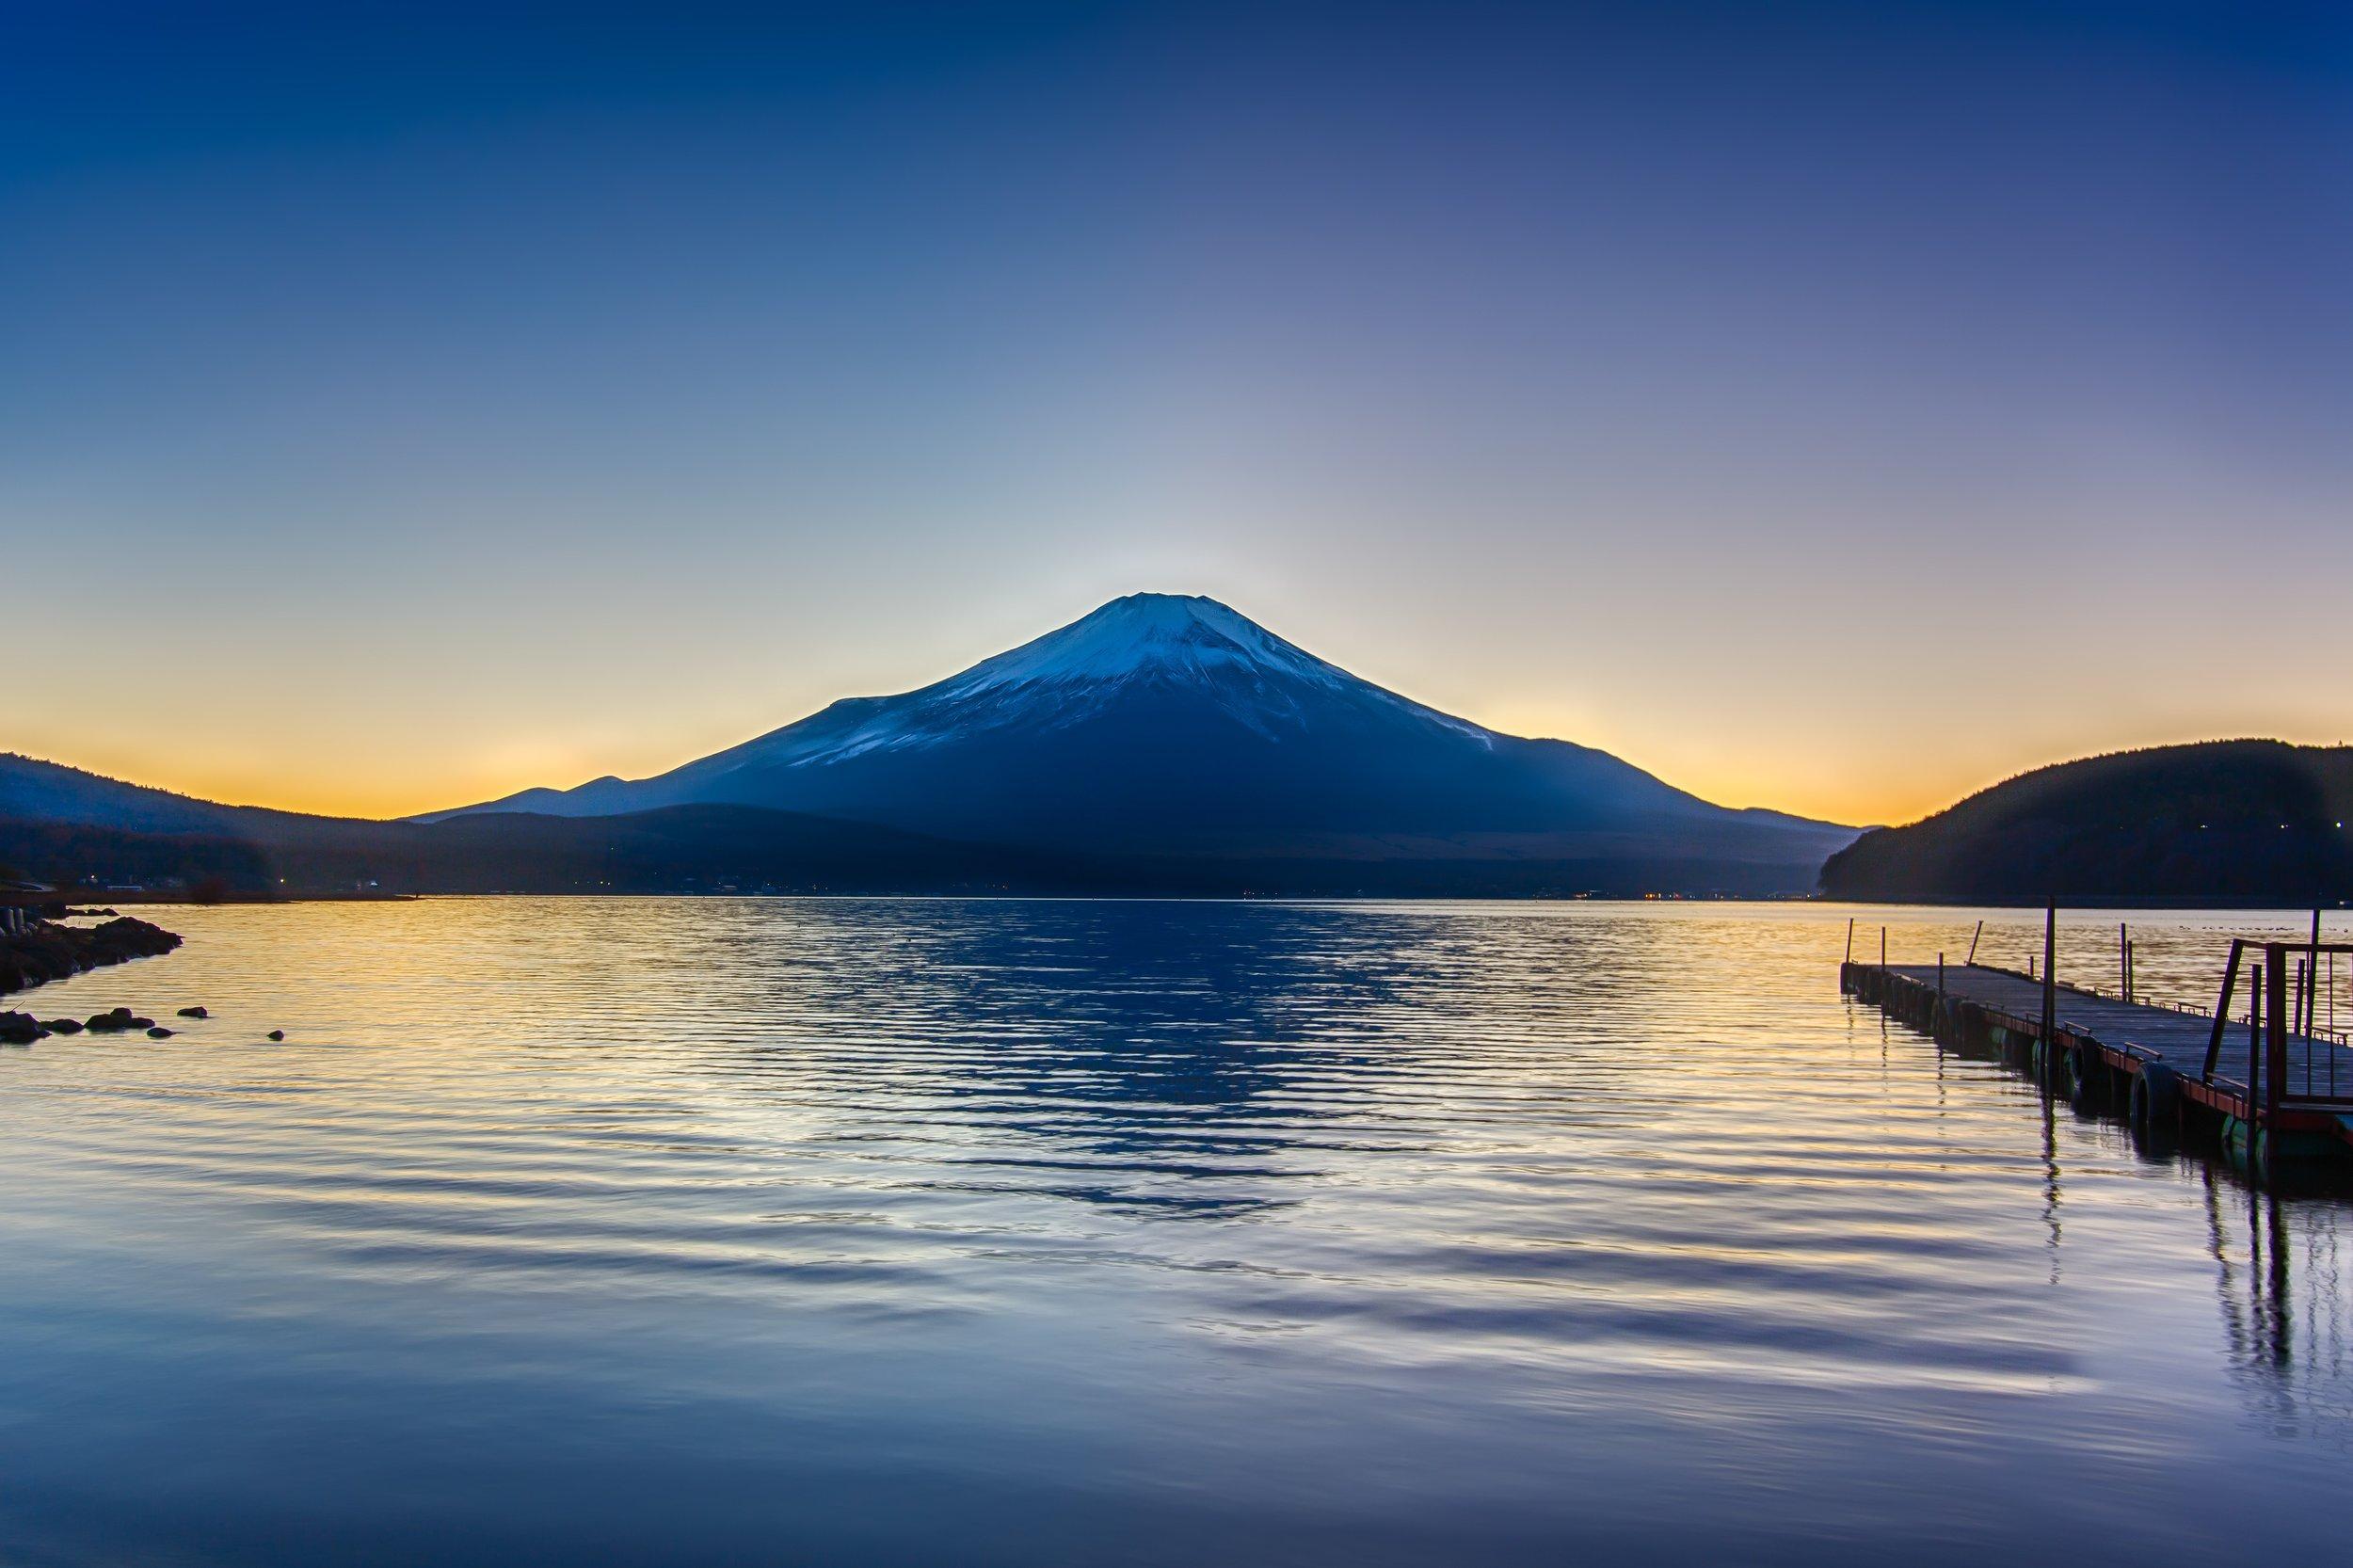 PHOTOGRAPHY: Andy Yee • Canon EOS 5D MkIII • 16-28mm Ƒ/2.8 @ 25MM • Ƒ/9 • bulb • ISO 100